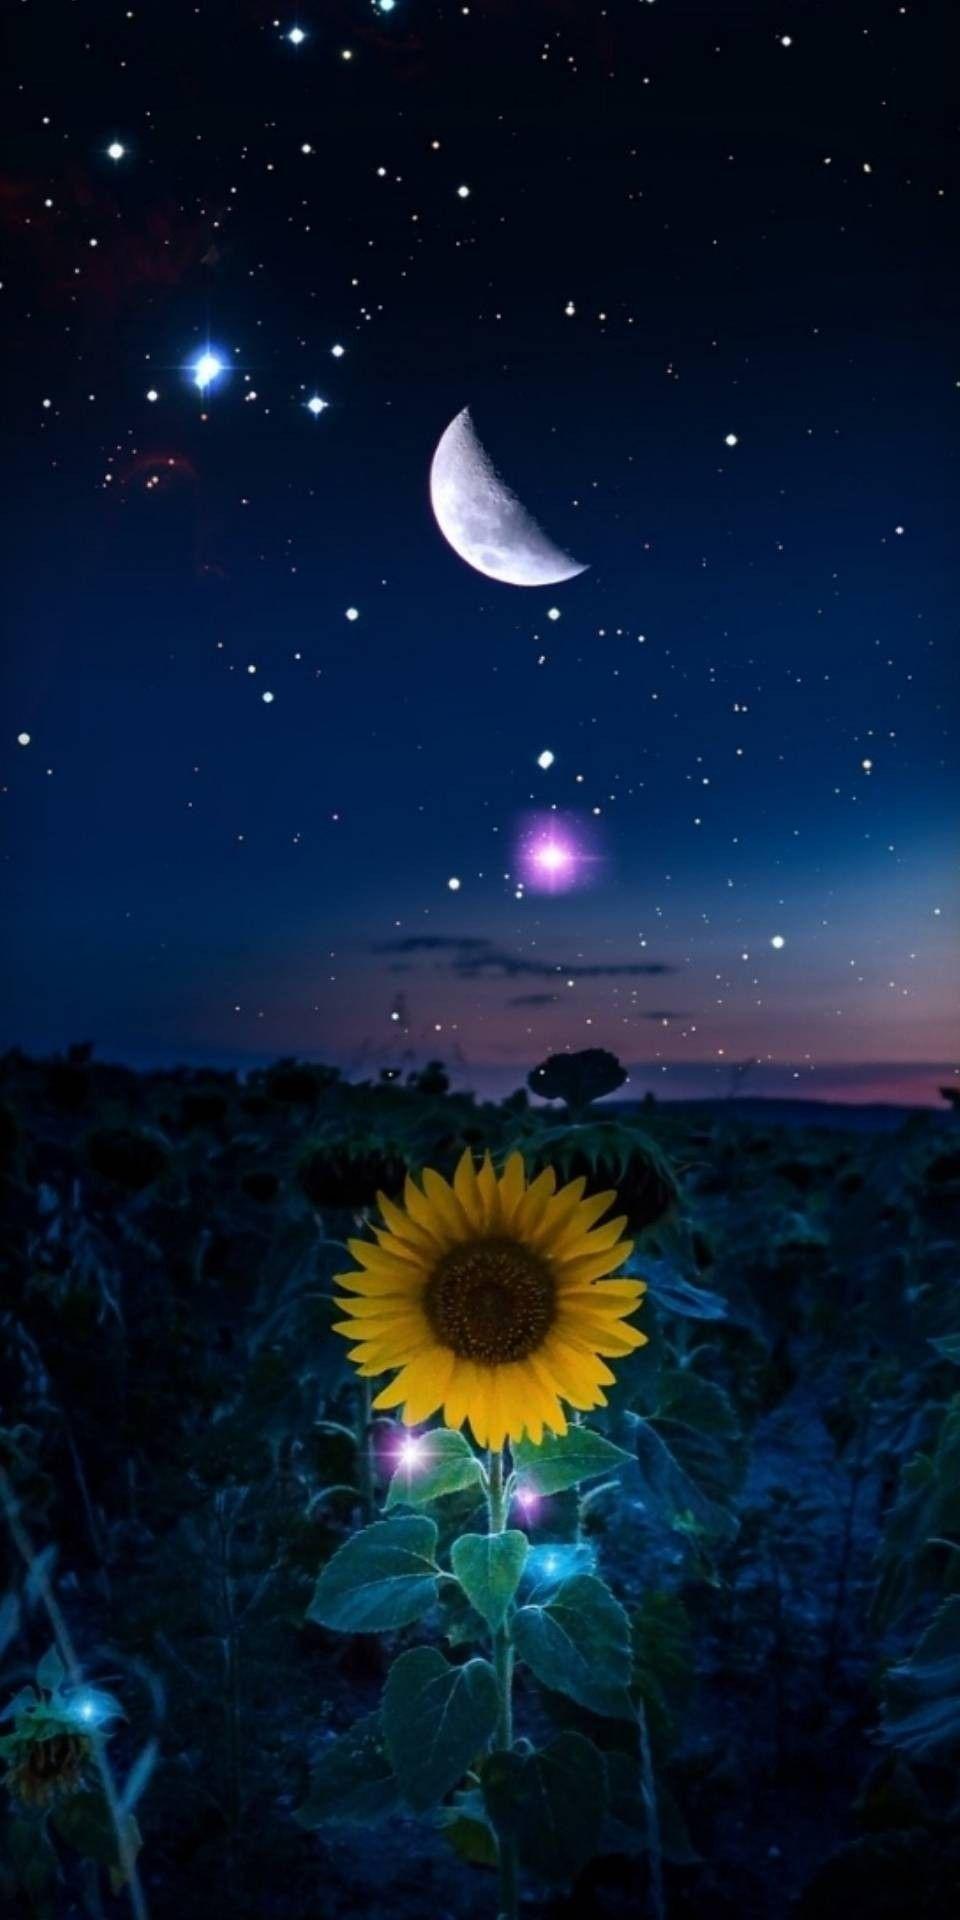 Pin By Renato Ferreira On Wallpaper Starry Night Wallpaper Sunflower Iphone Wallpaper Sunflower Wallpaper